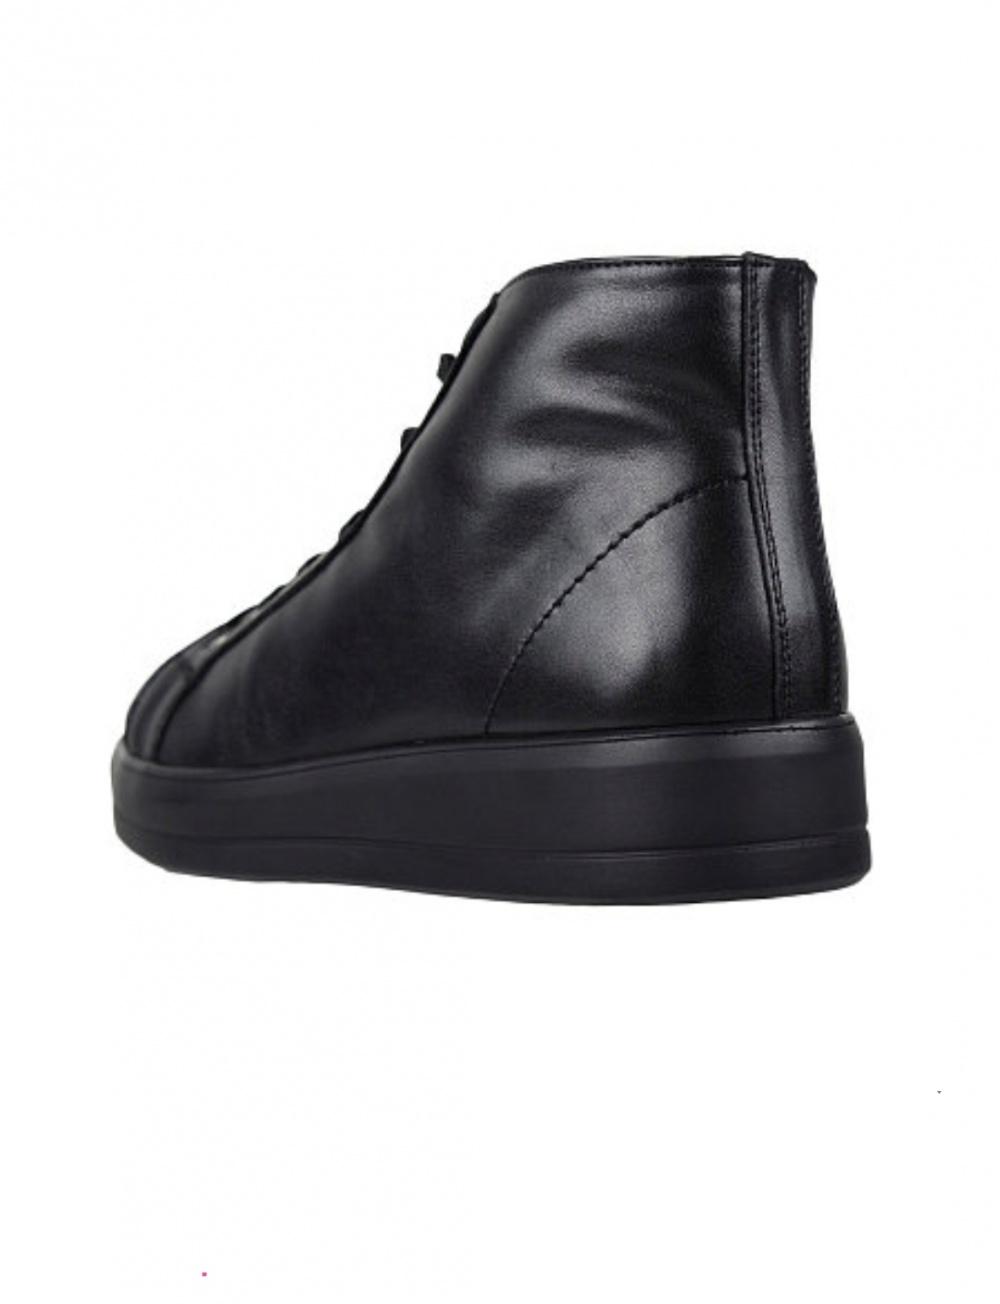 Ботинки Berg, размер 39